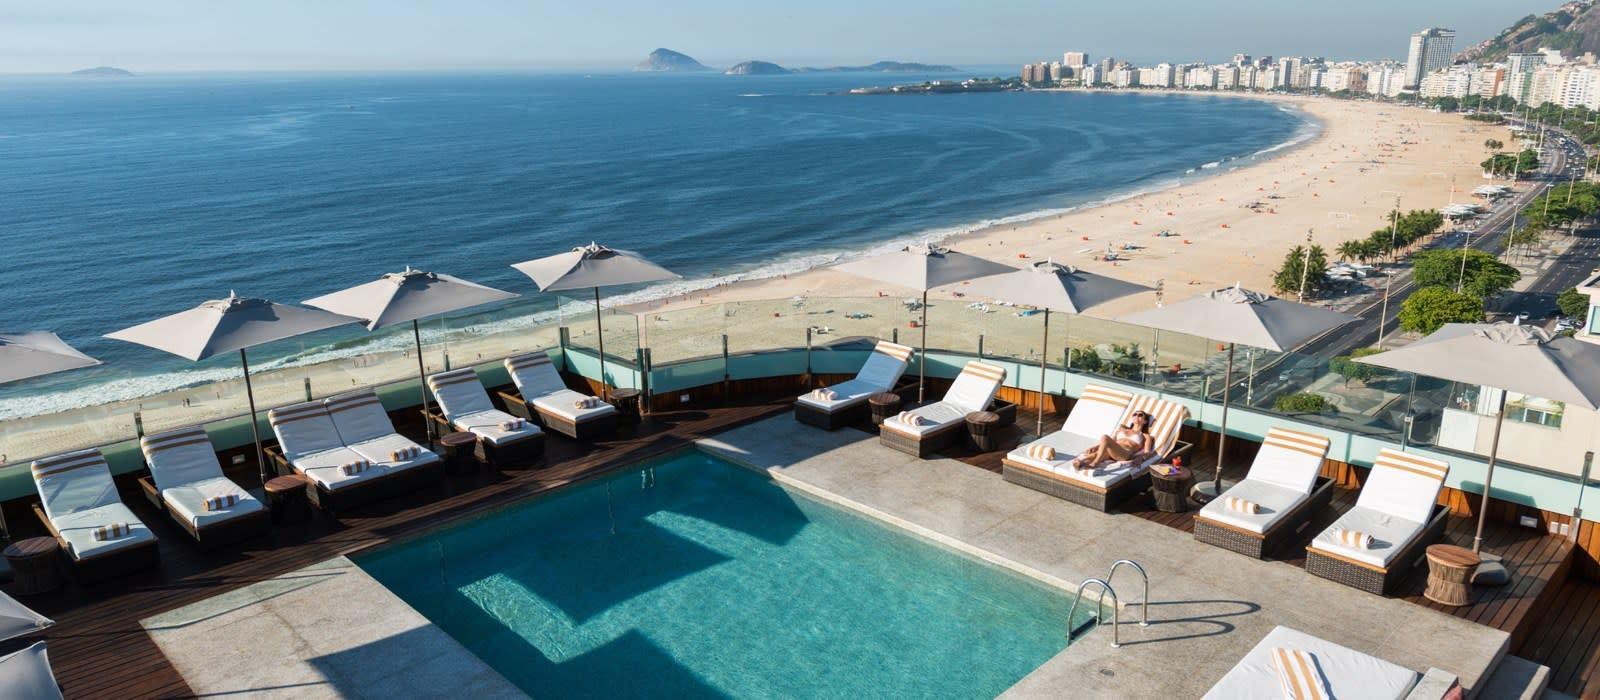 Hotel PortoBay Rio Brasilien